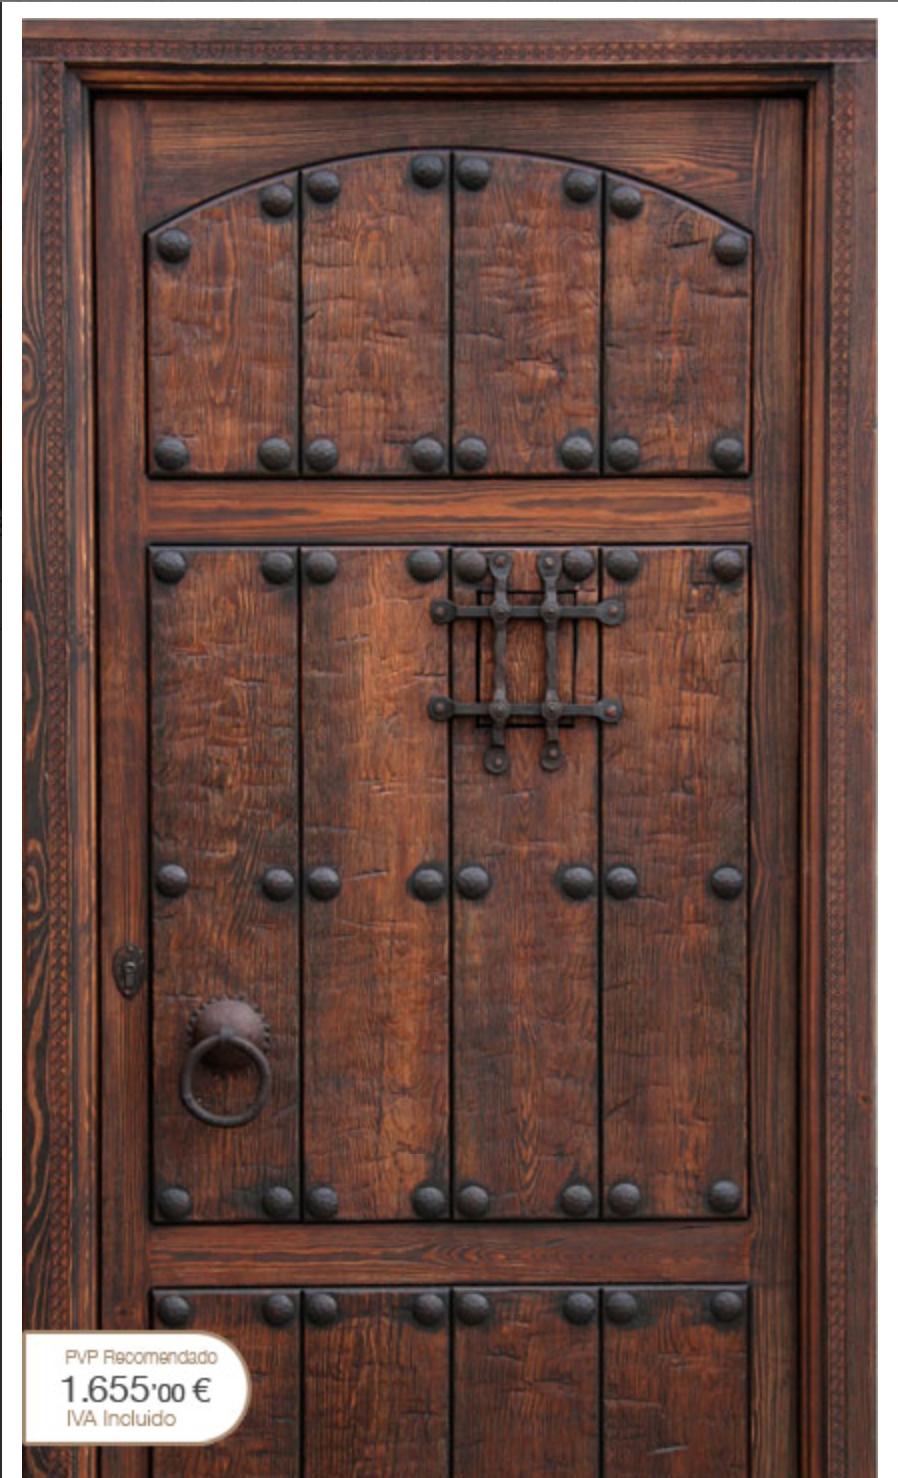 Puerta Exterior Opcion 2 Diseno De Puerta De Madera Diseno De Puertas Modernas Puertas Rusticas